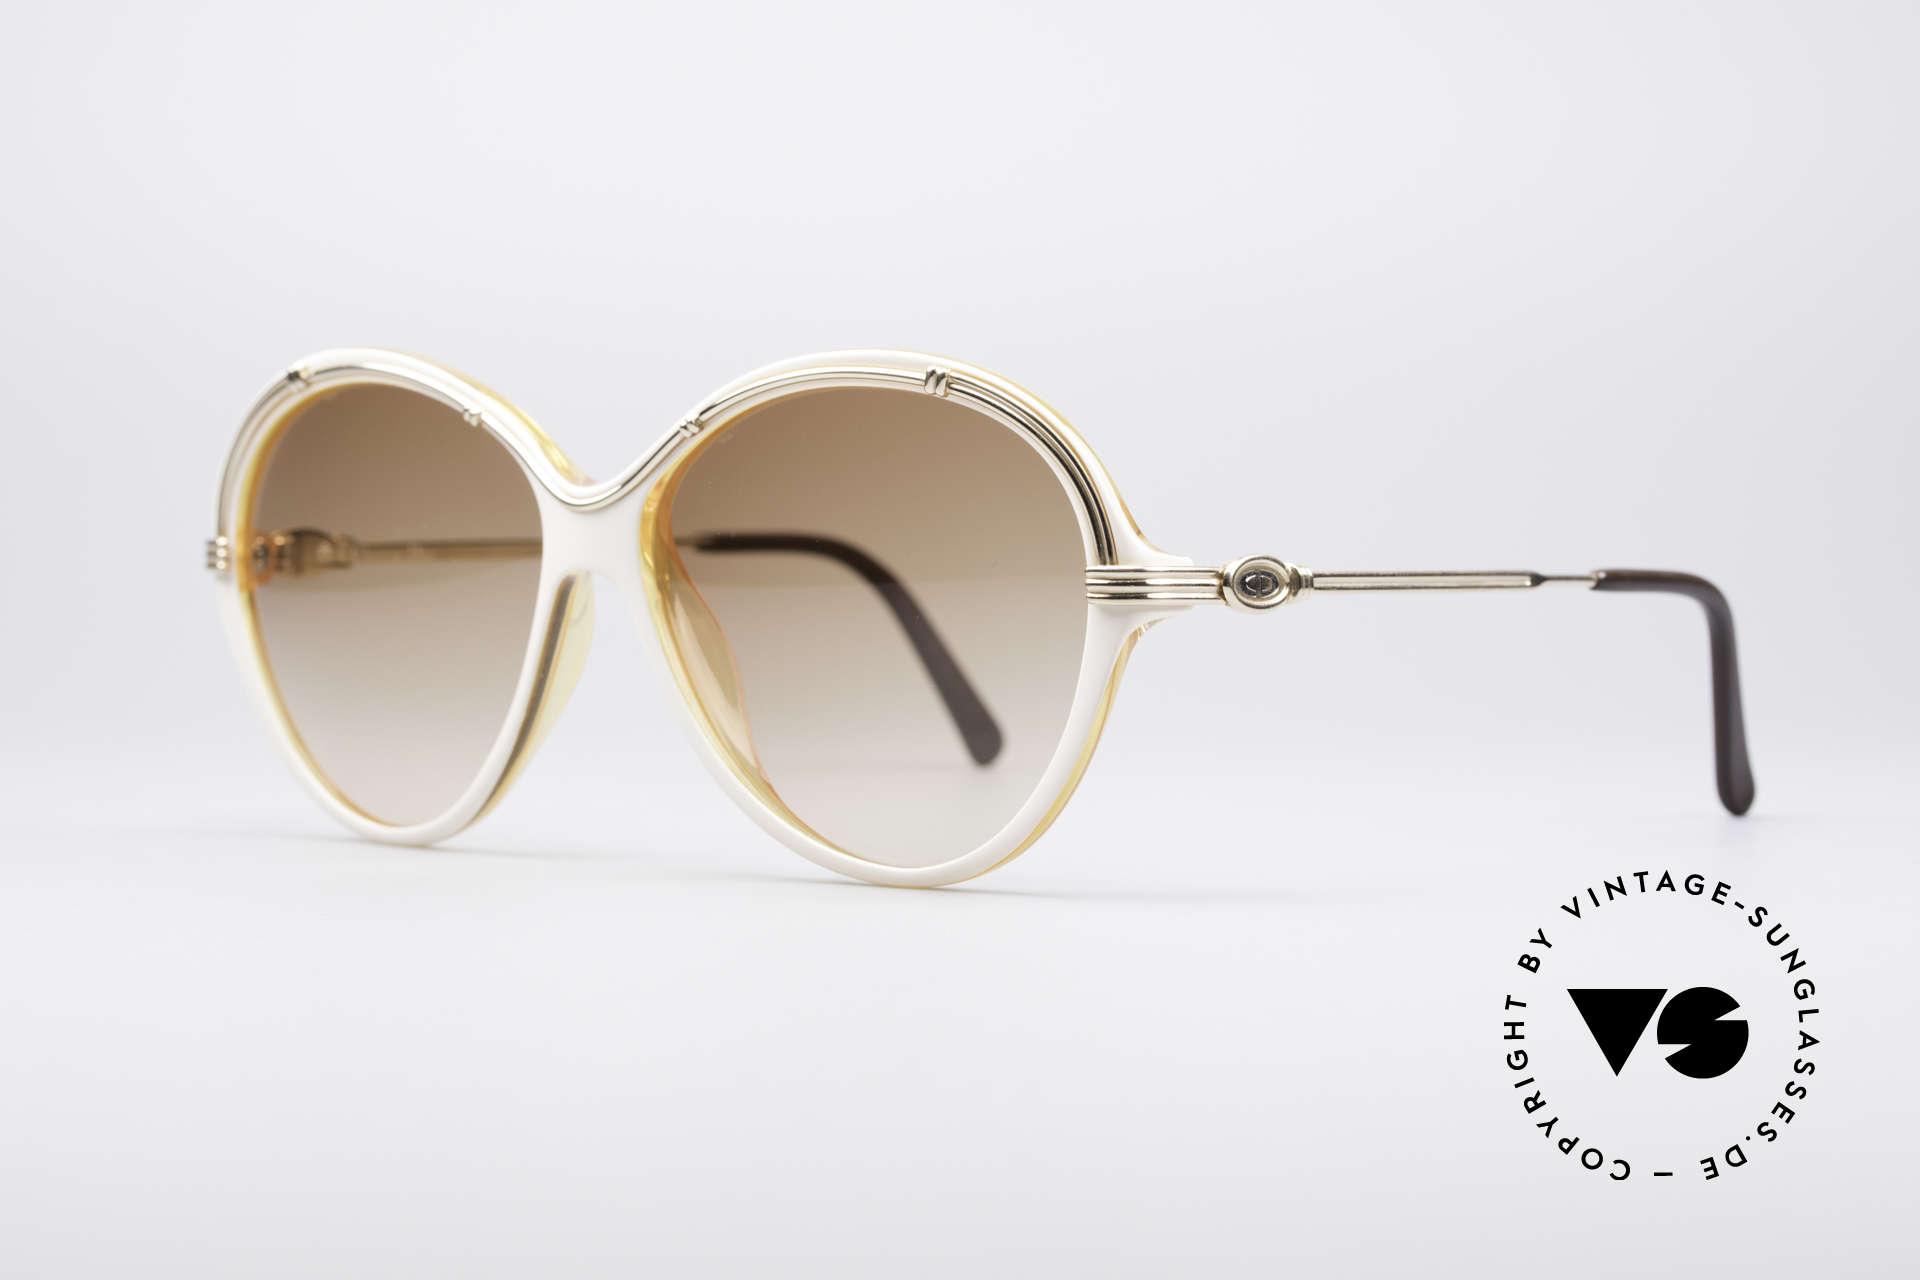 Christian Dior 2251 80's Ladies Shades, fantastic frame design; simply elegant & unique, Made for Women